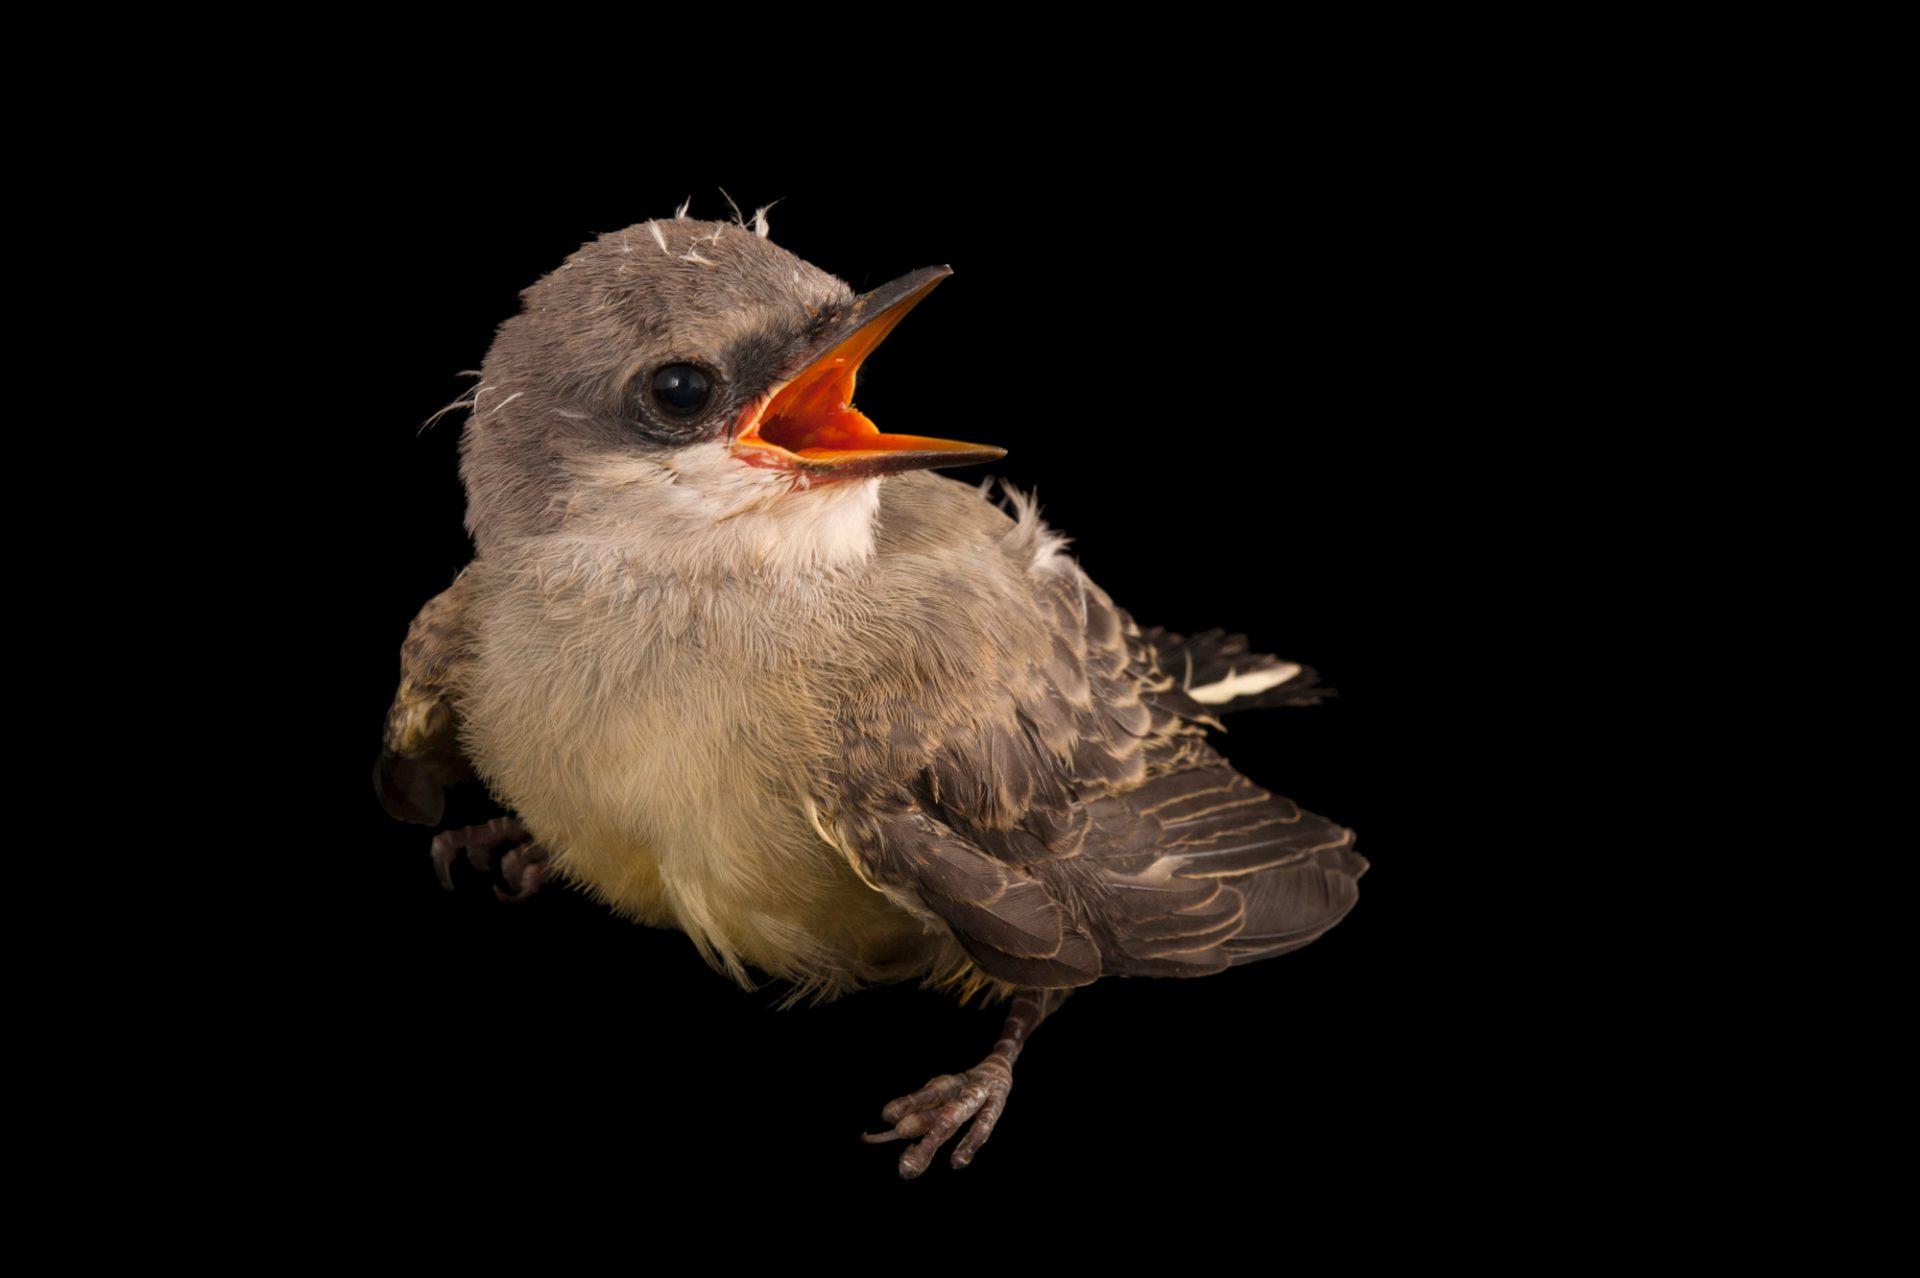 Western kingbird chick, Tyrannus verticalis, at the home of wildlife rescuer in Lincoln, Nebraska.